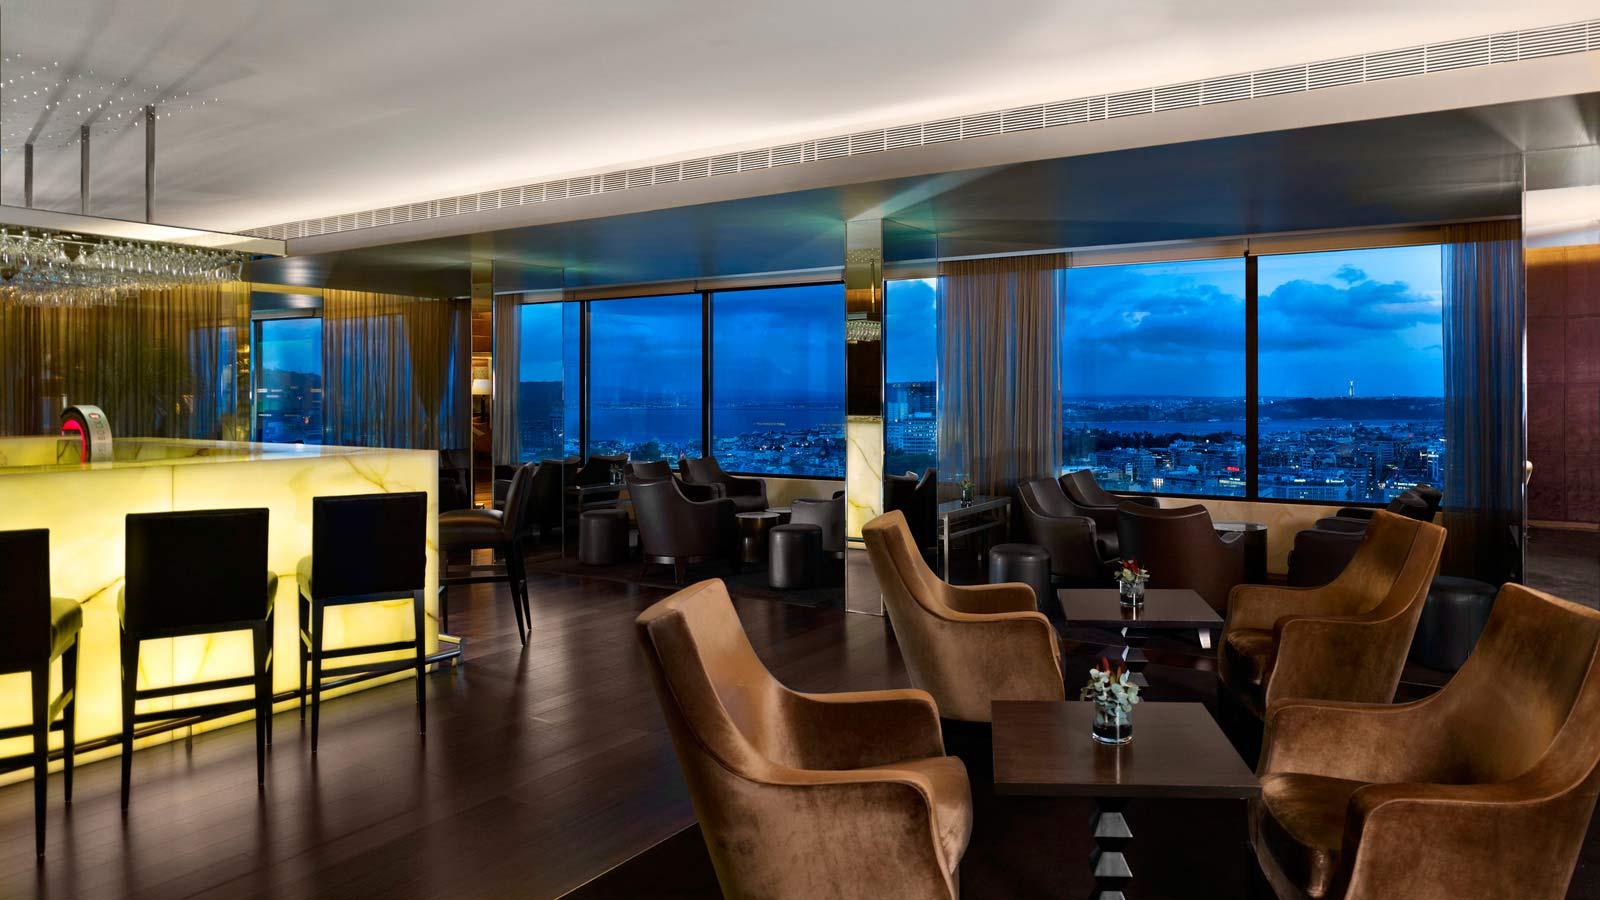 Panorama Bar - Bar Panoramique - Hotel Sheraton - Lisbonne